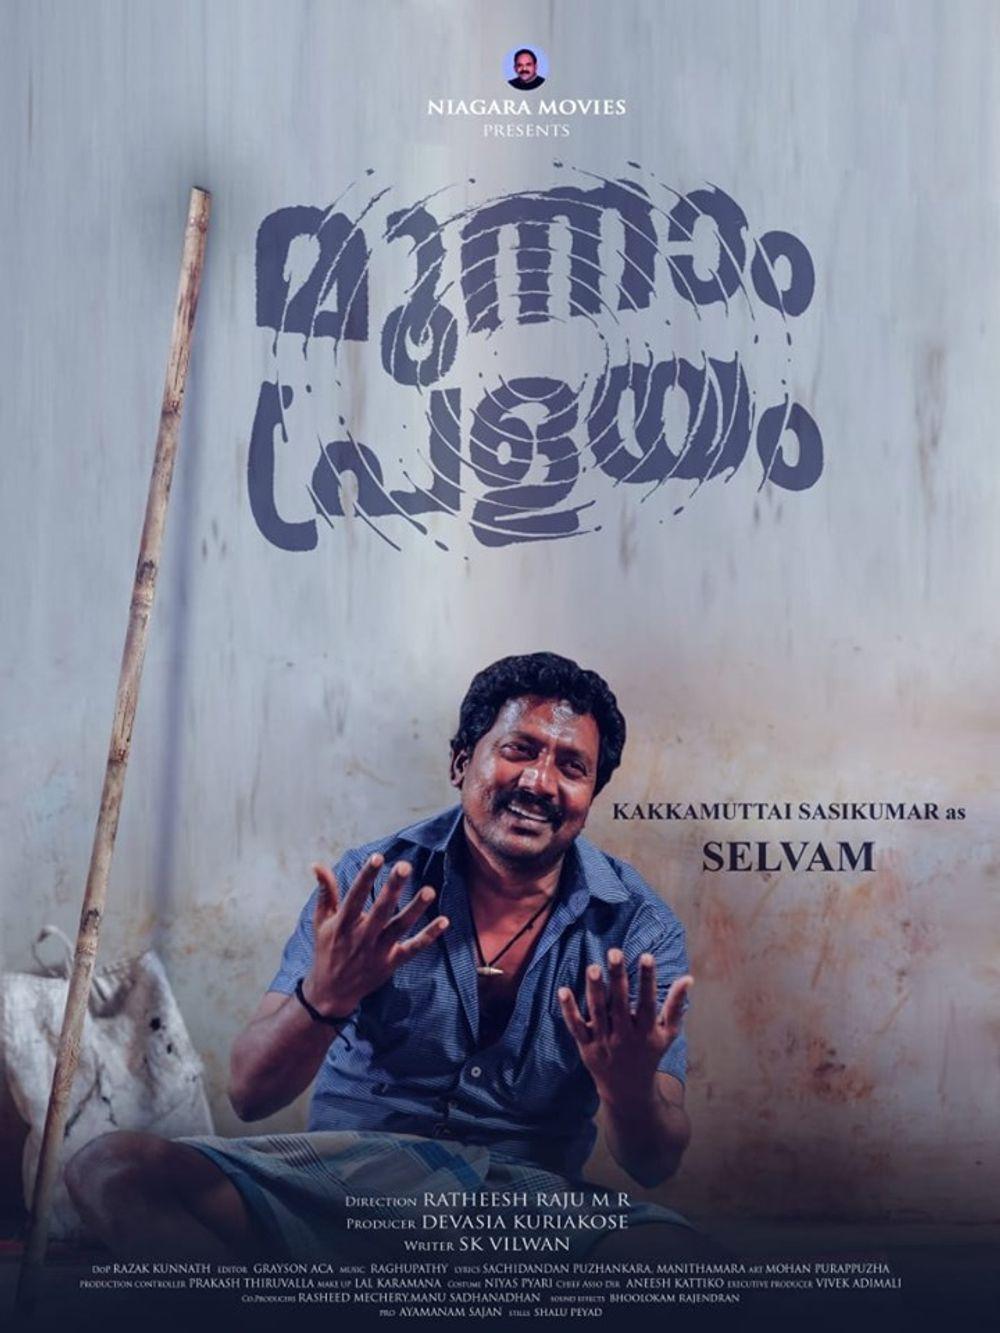 Moonnam Pralayam Movie Review